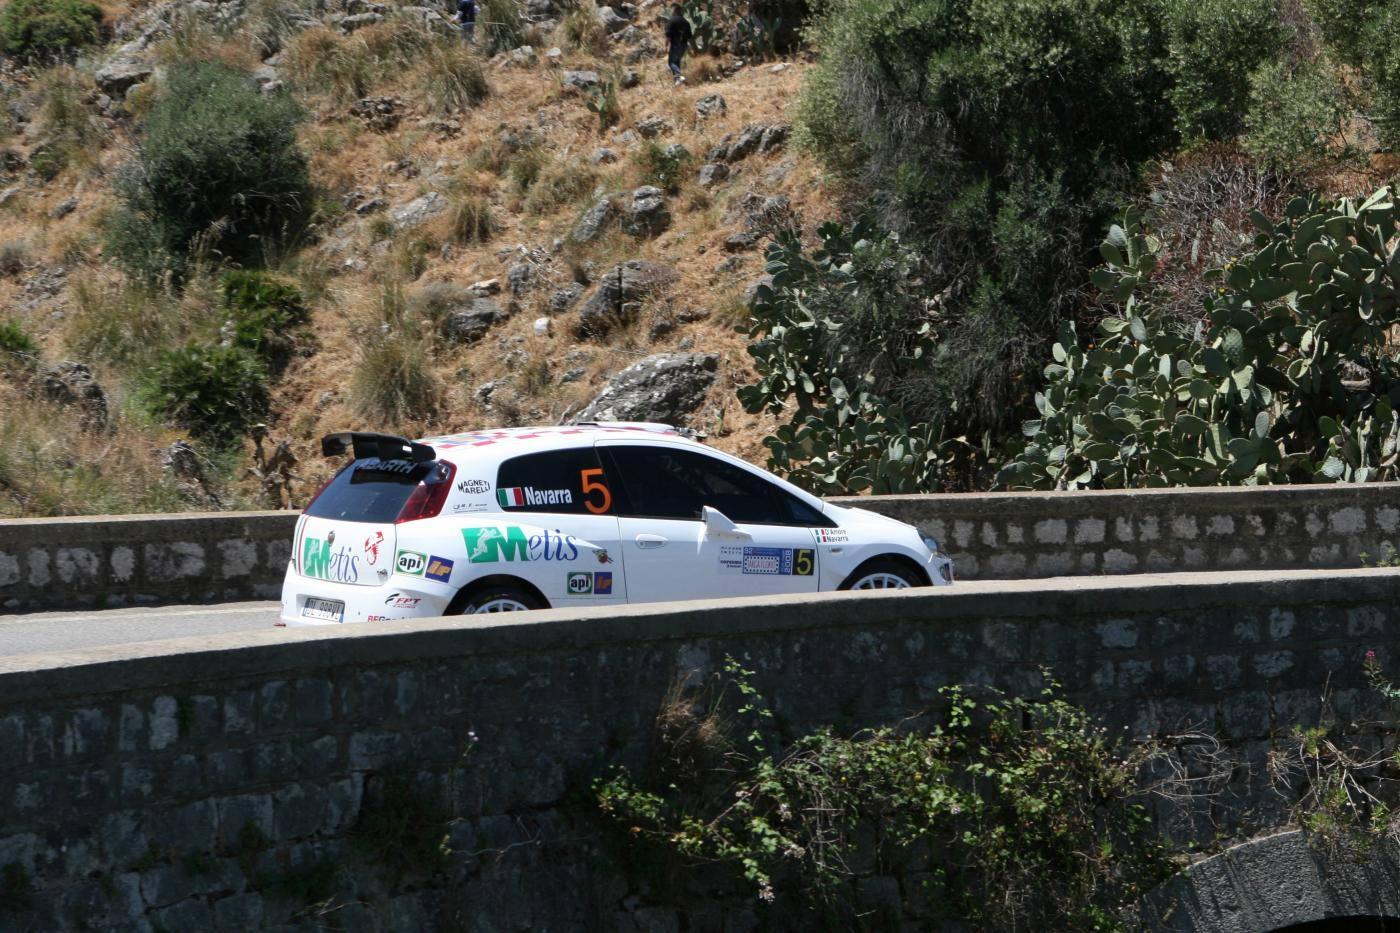 Incidente al rally Targa Florio: morti Giuseppe Laganà e Mauro Amendolia